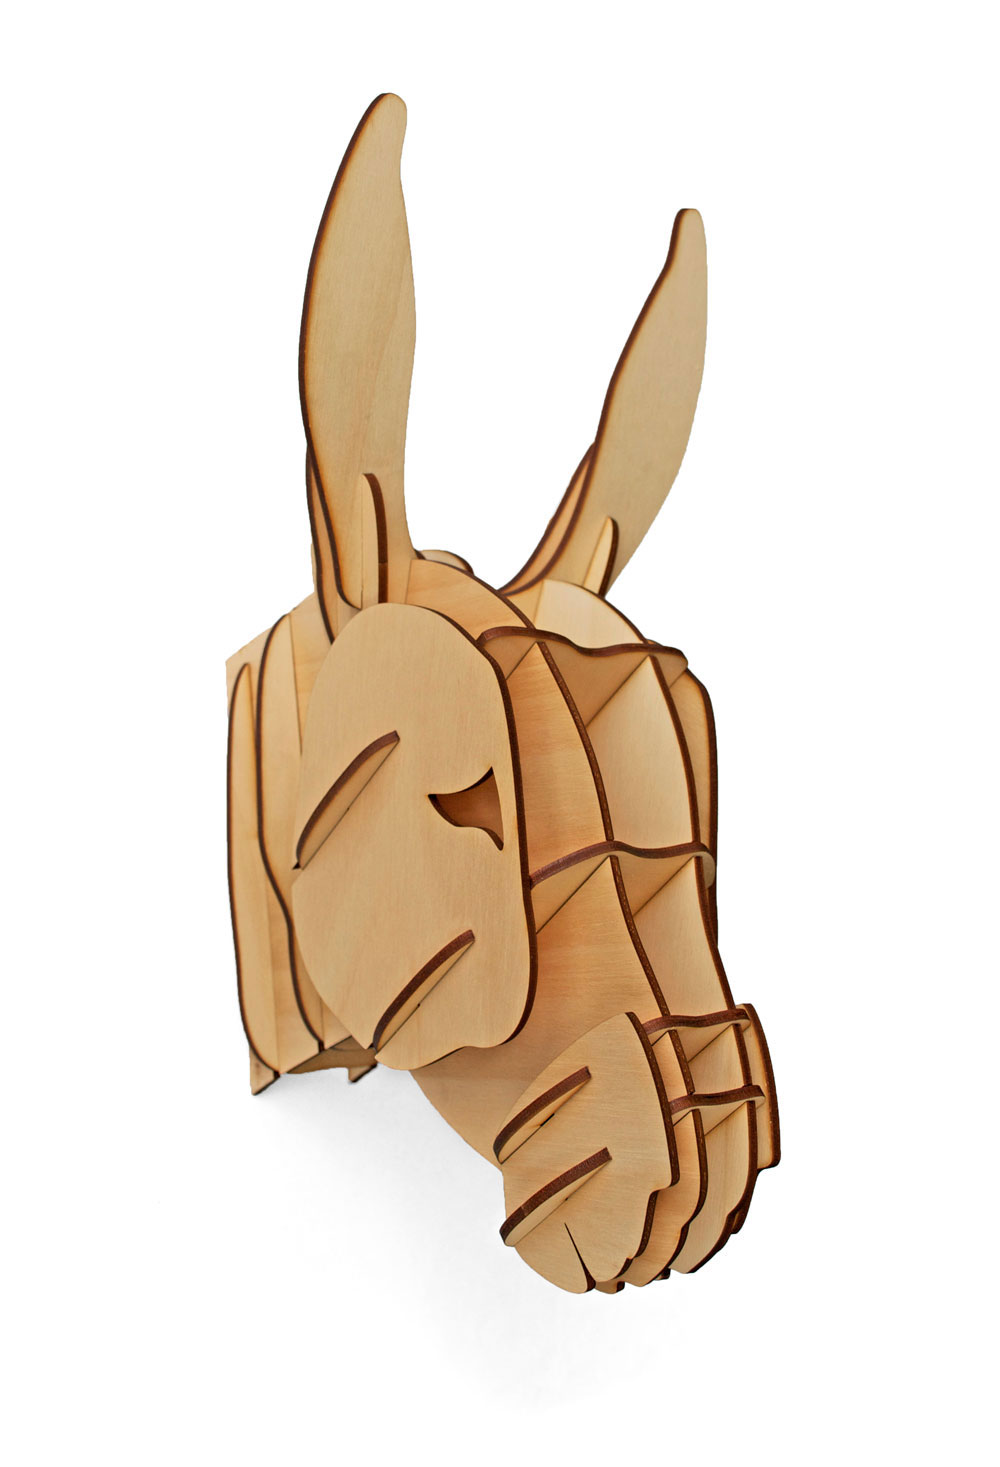 donkeyhead1sm